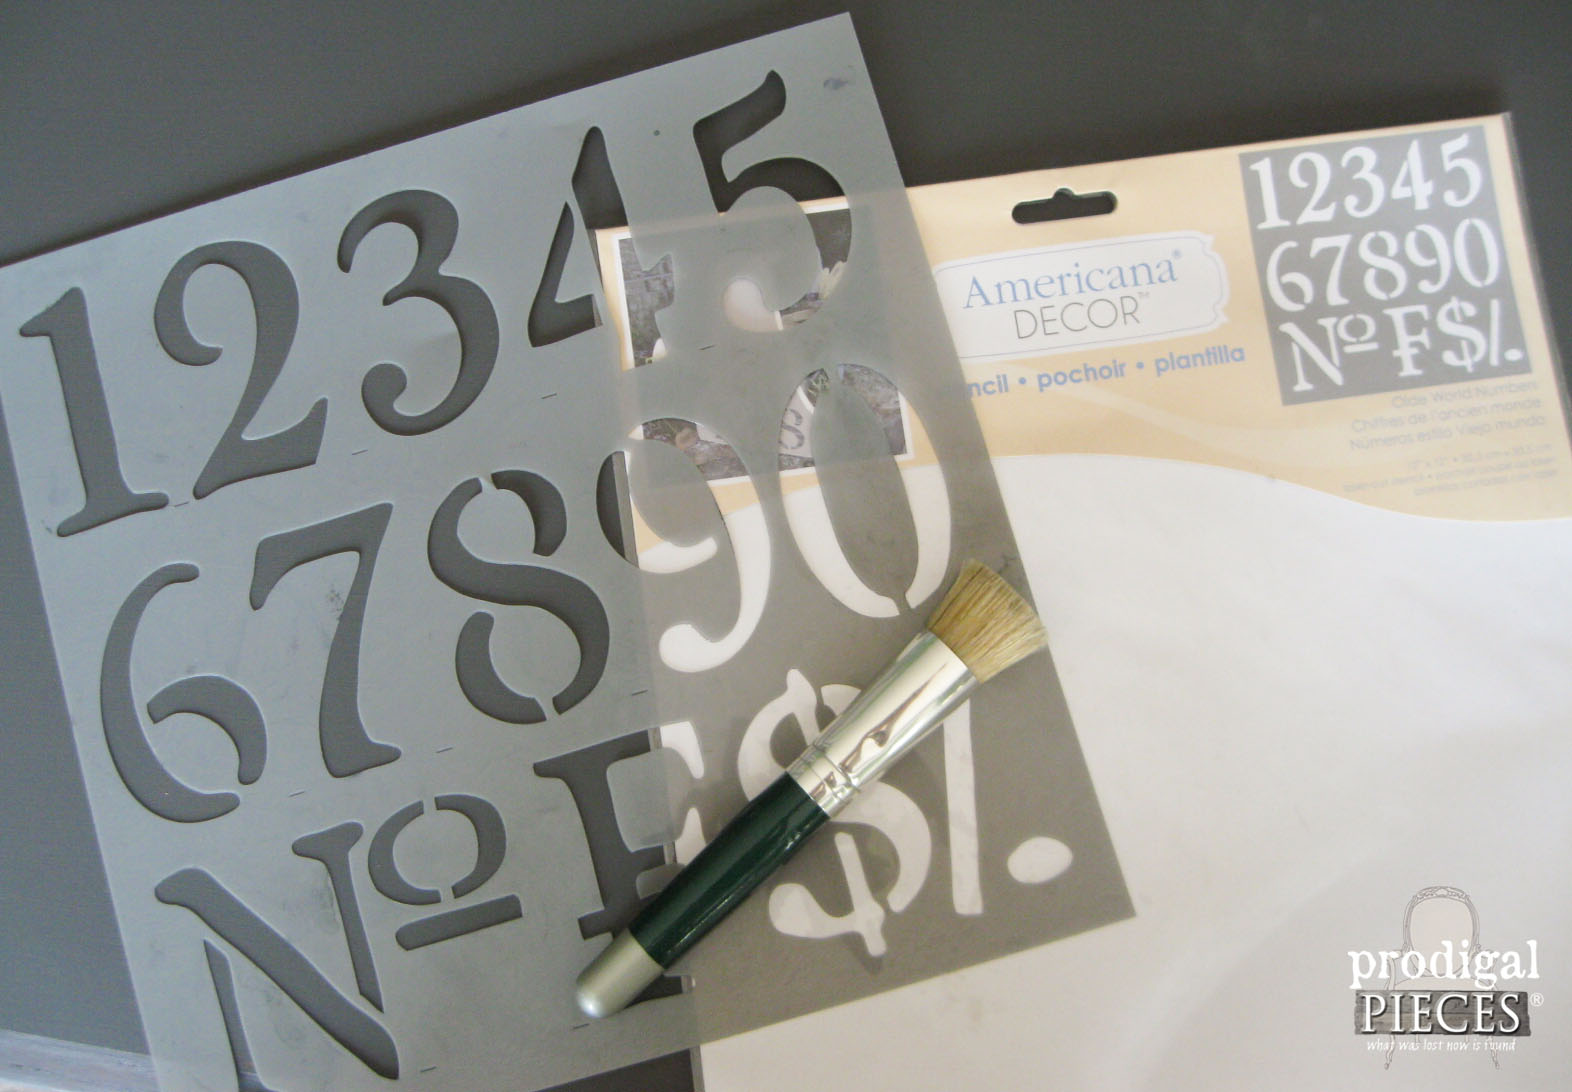 DecoArt Olde World Numbers Stencil | Prodigal Pieces | www.prodigalpieces.com